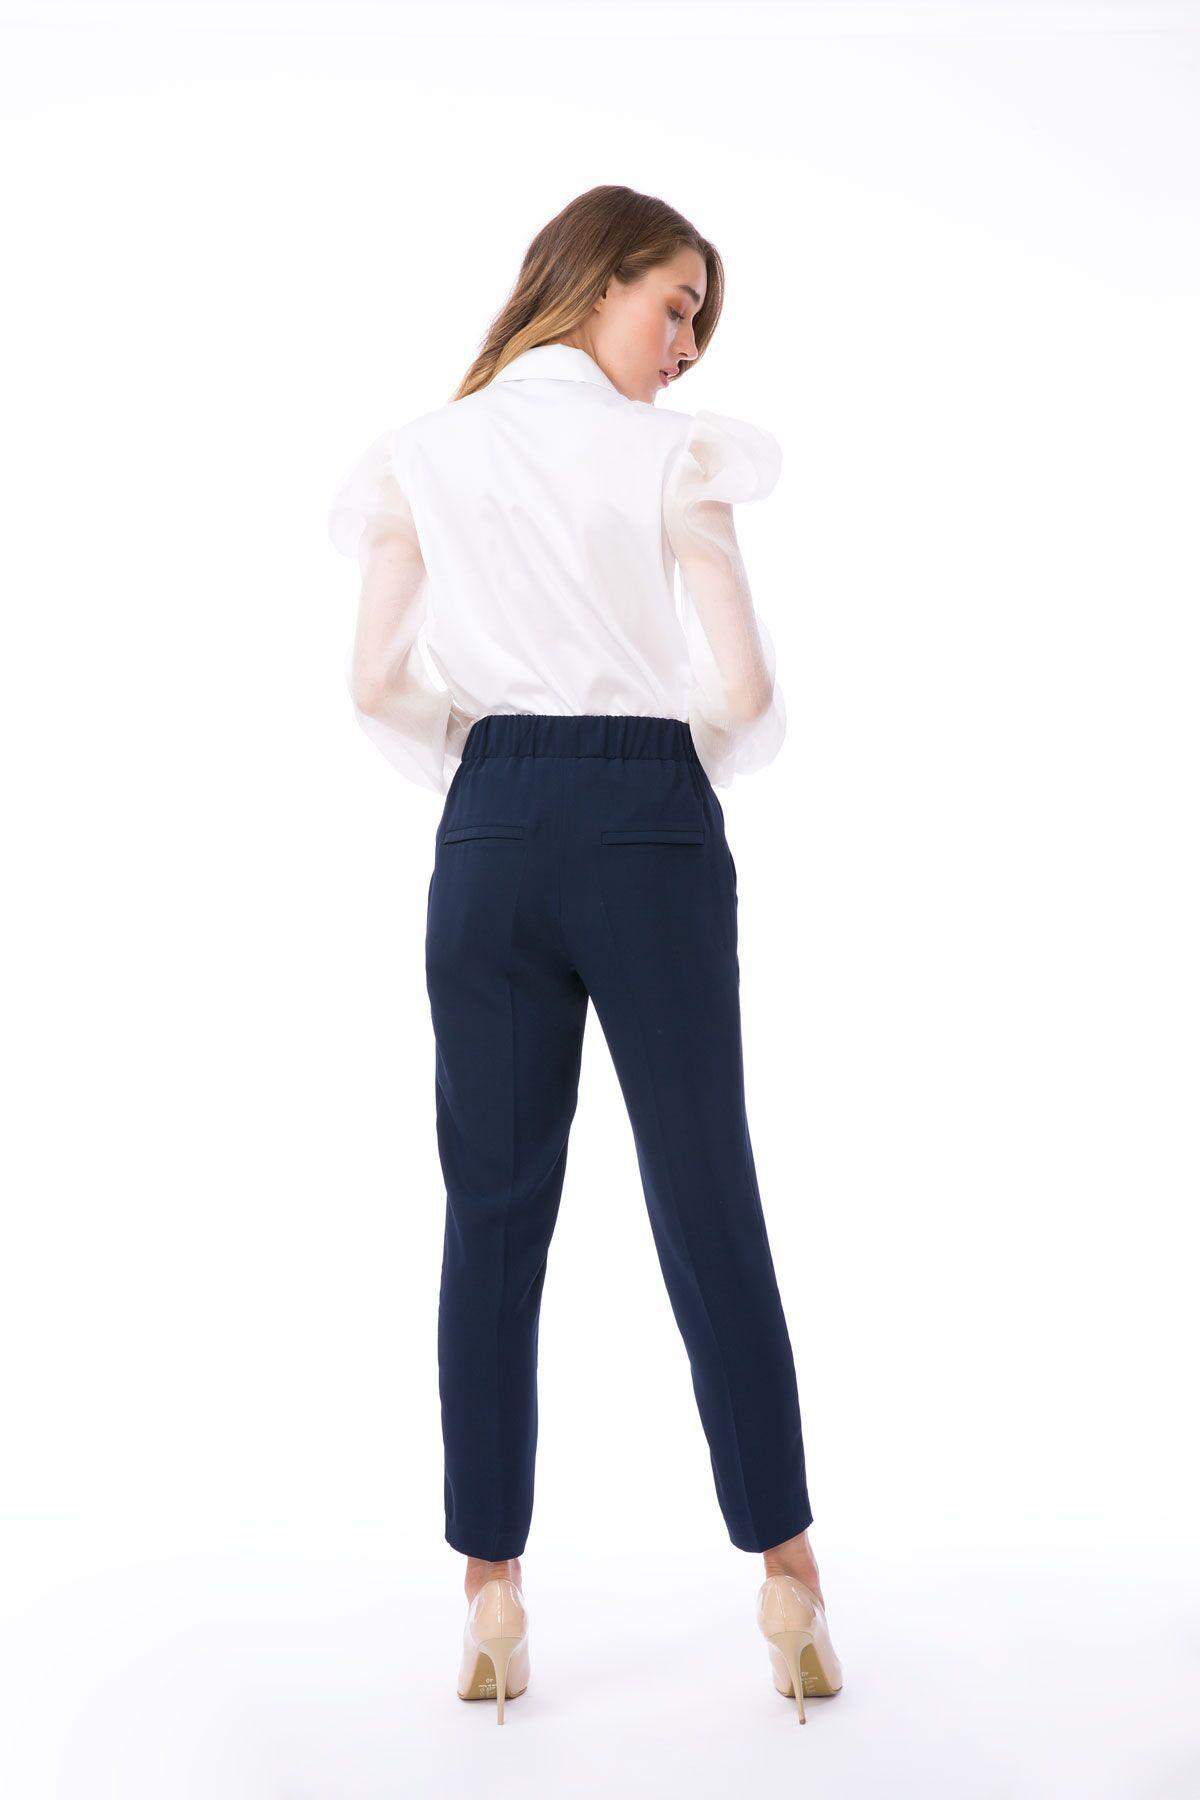 Havuç Kesim Bağcıklı Lacivert Kumaş Pantolon